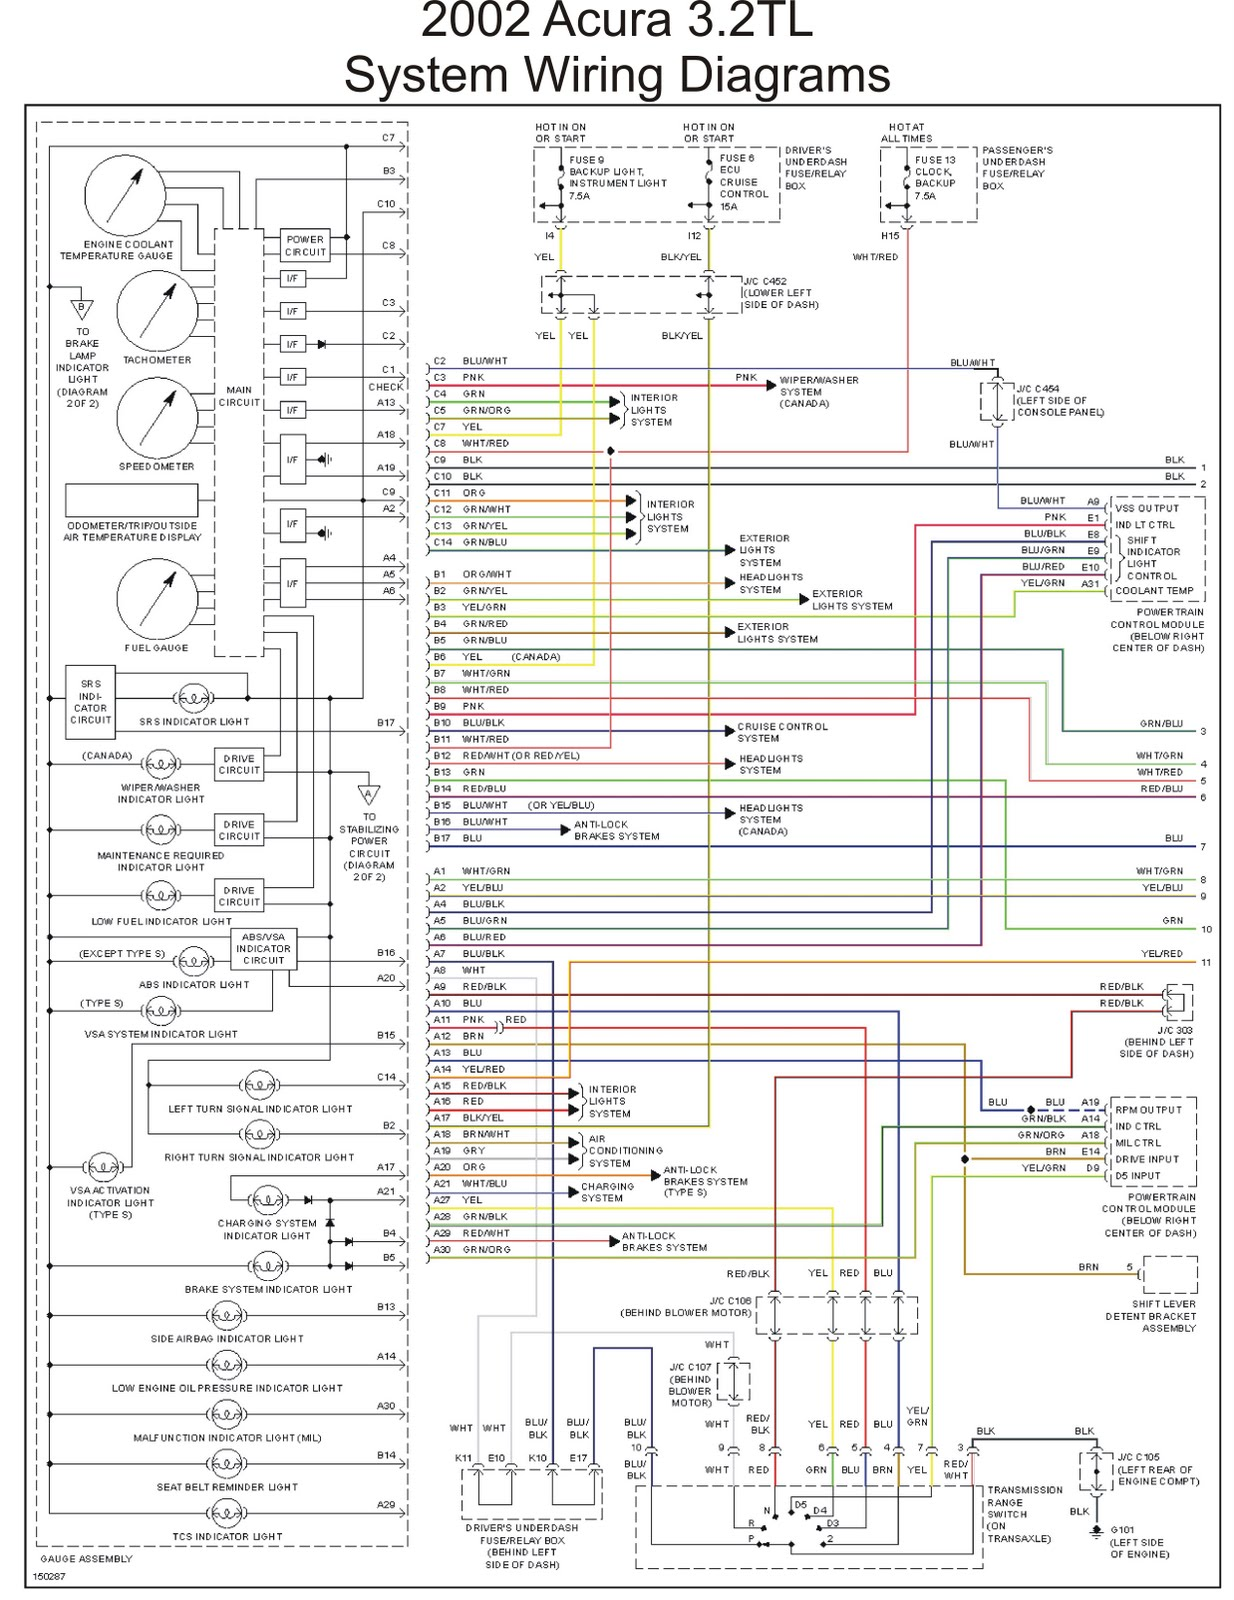 wiring diagram color legend free download wiring diagram xwiaw rh xwiaw us Legend Race Car Wiring Diagram Electrical Schematic Legend